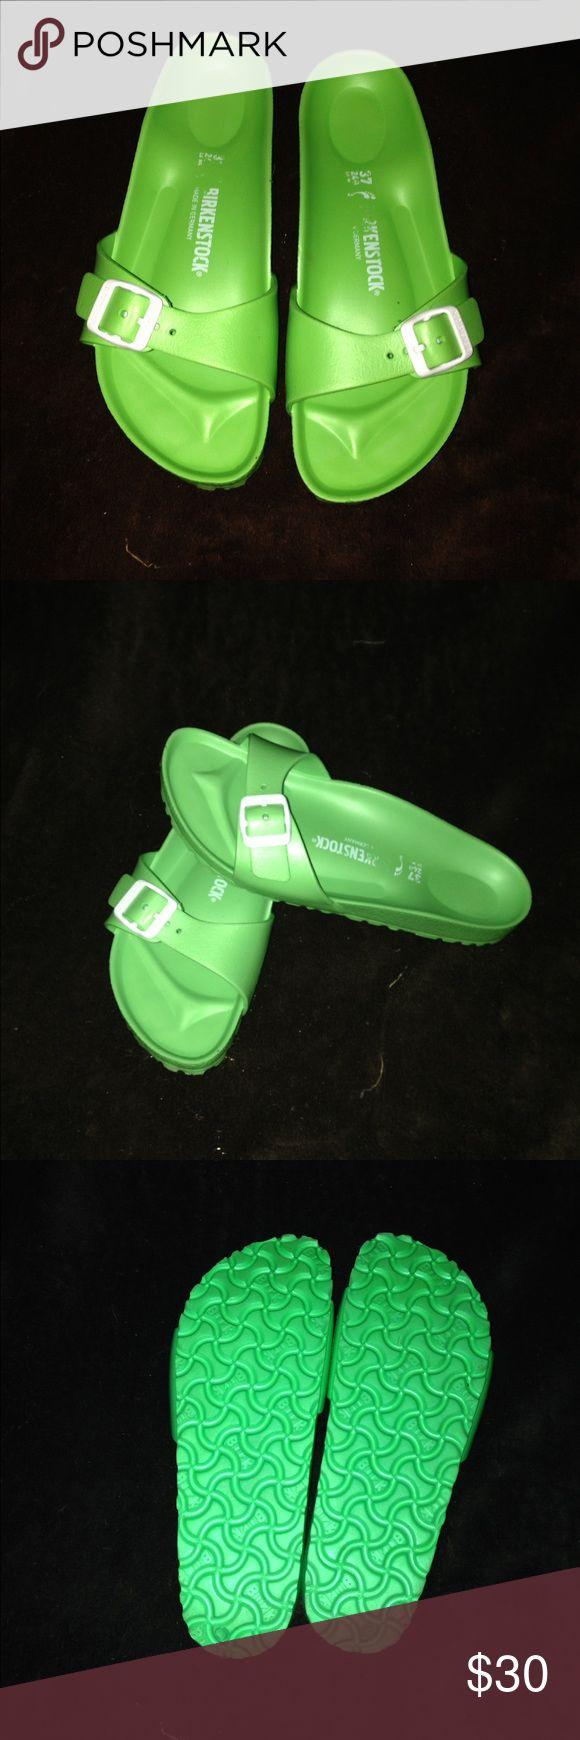 Birkenstock Neon green Madrid style size 37 trade value is retail price Birkenstock Shoes Sandals